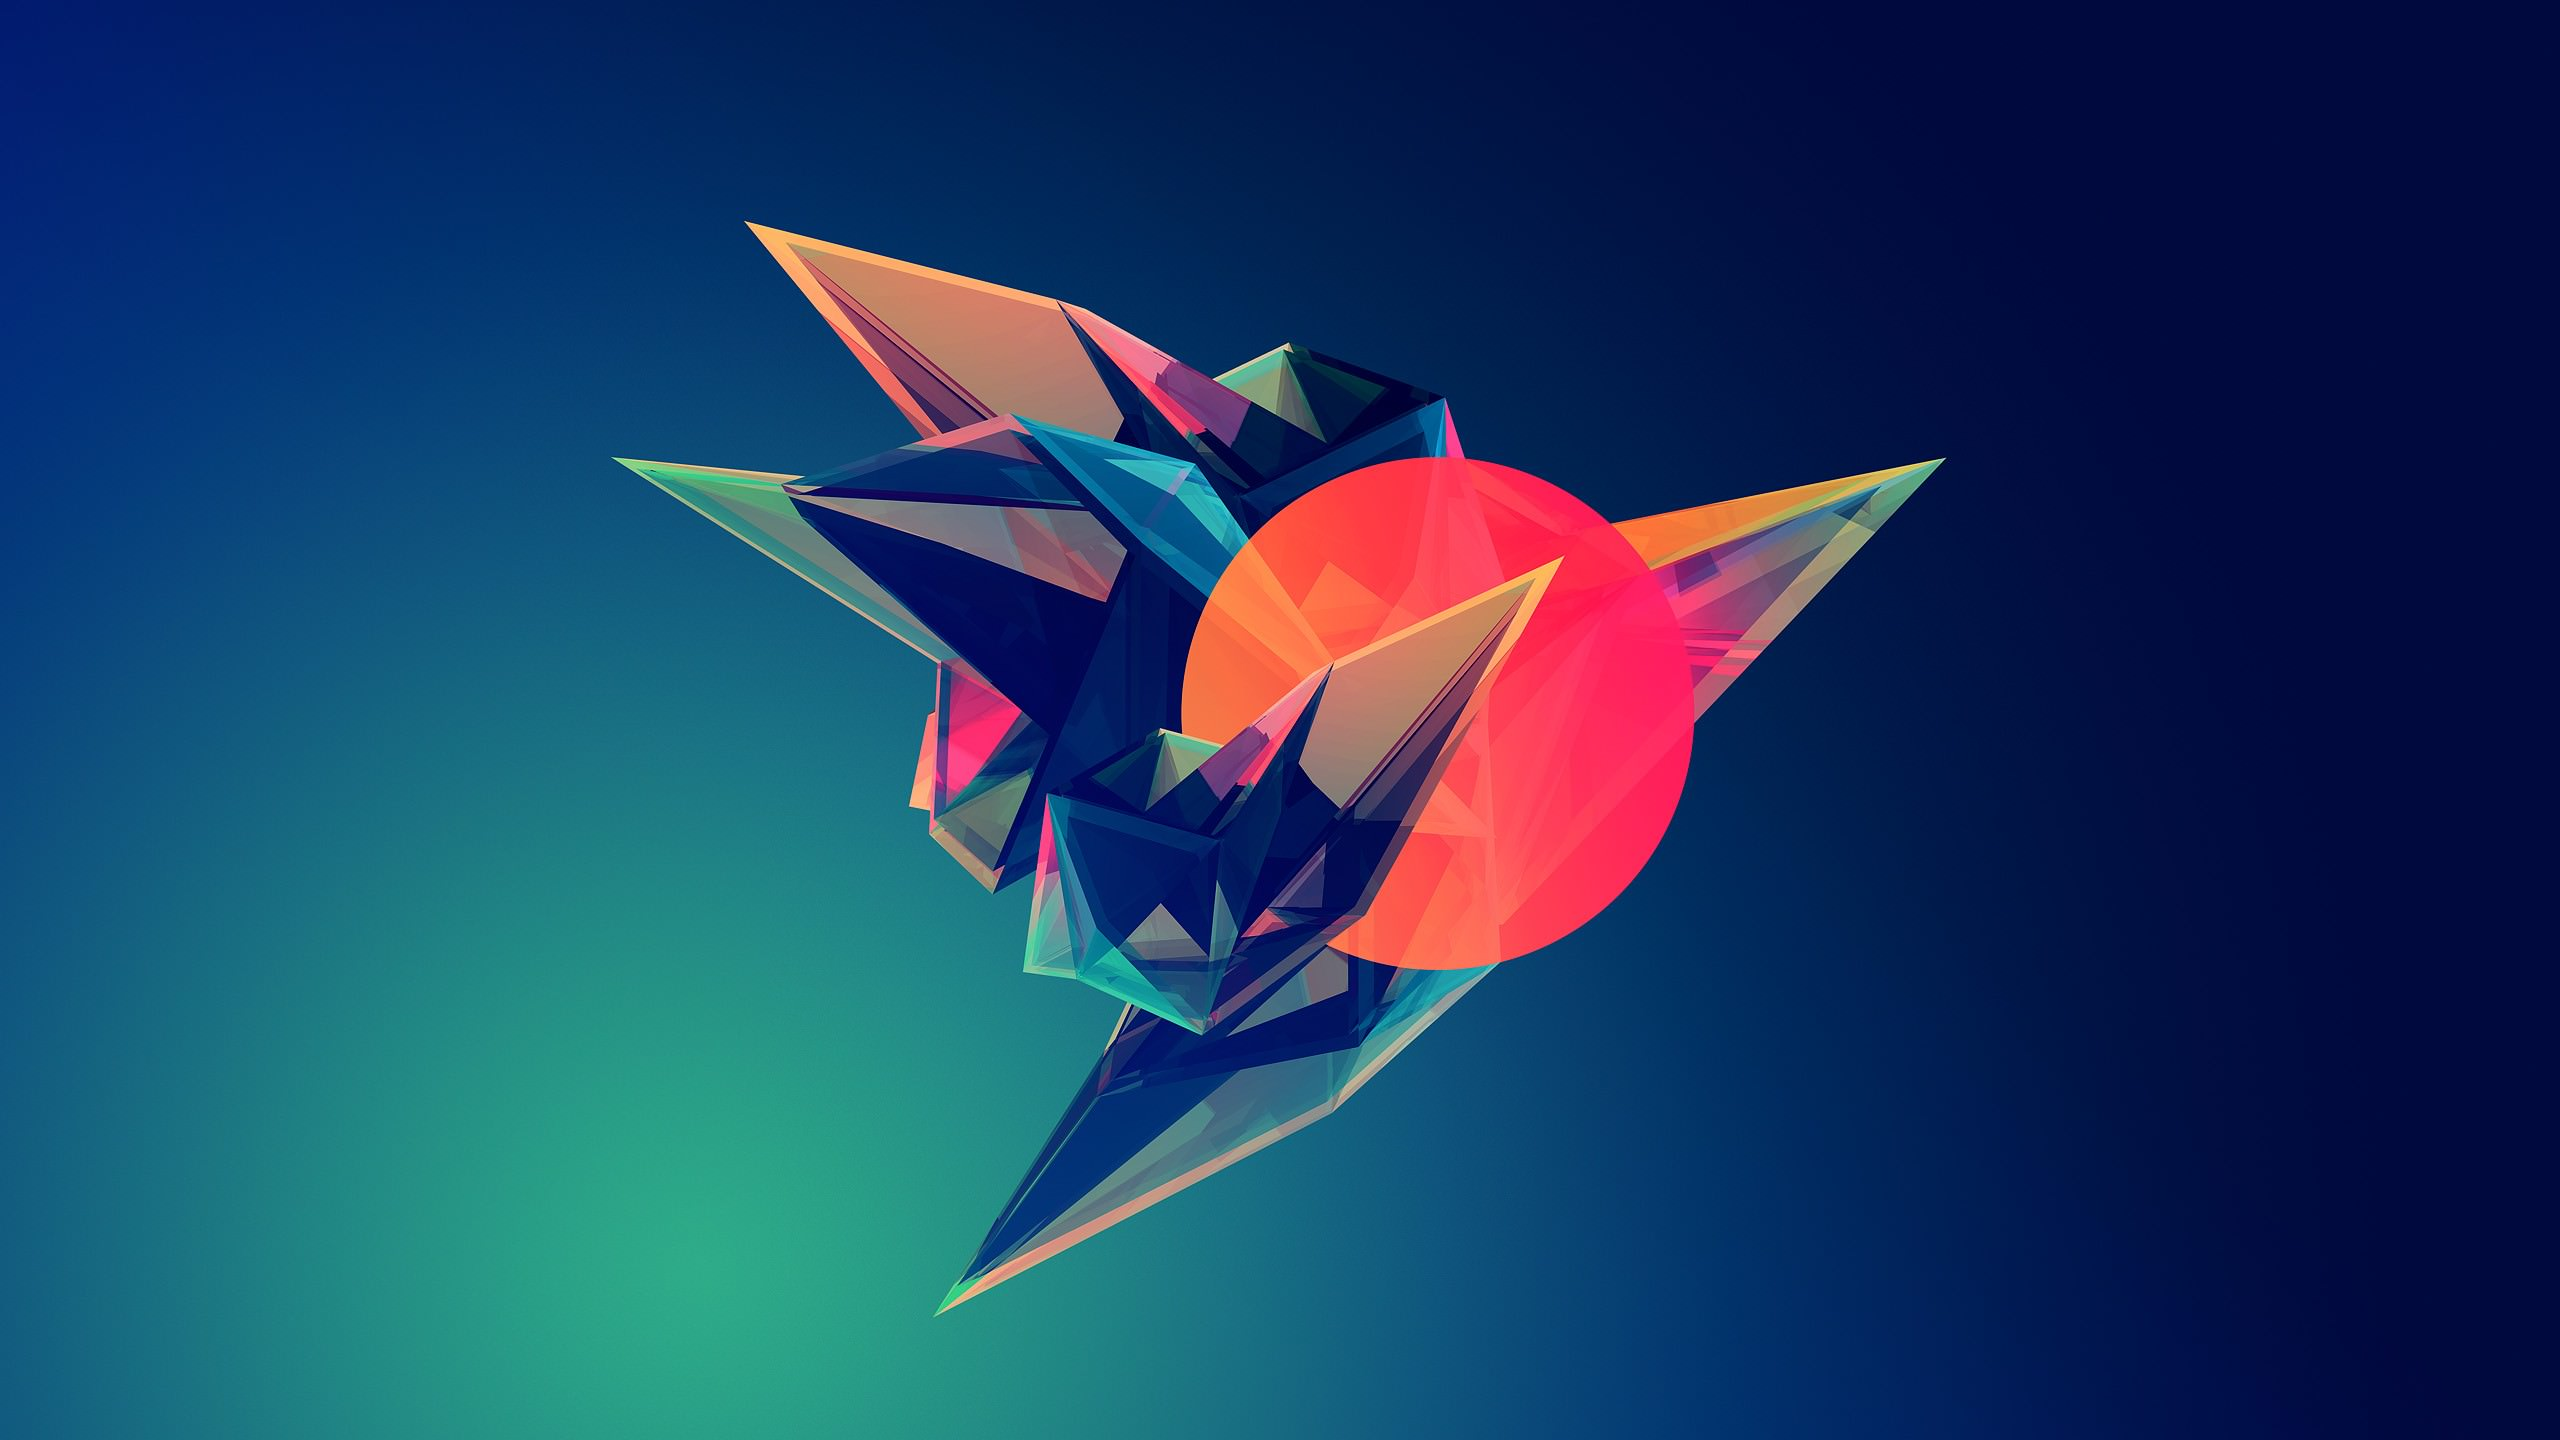 Abstract Digital Art Wallpaper